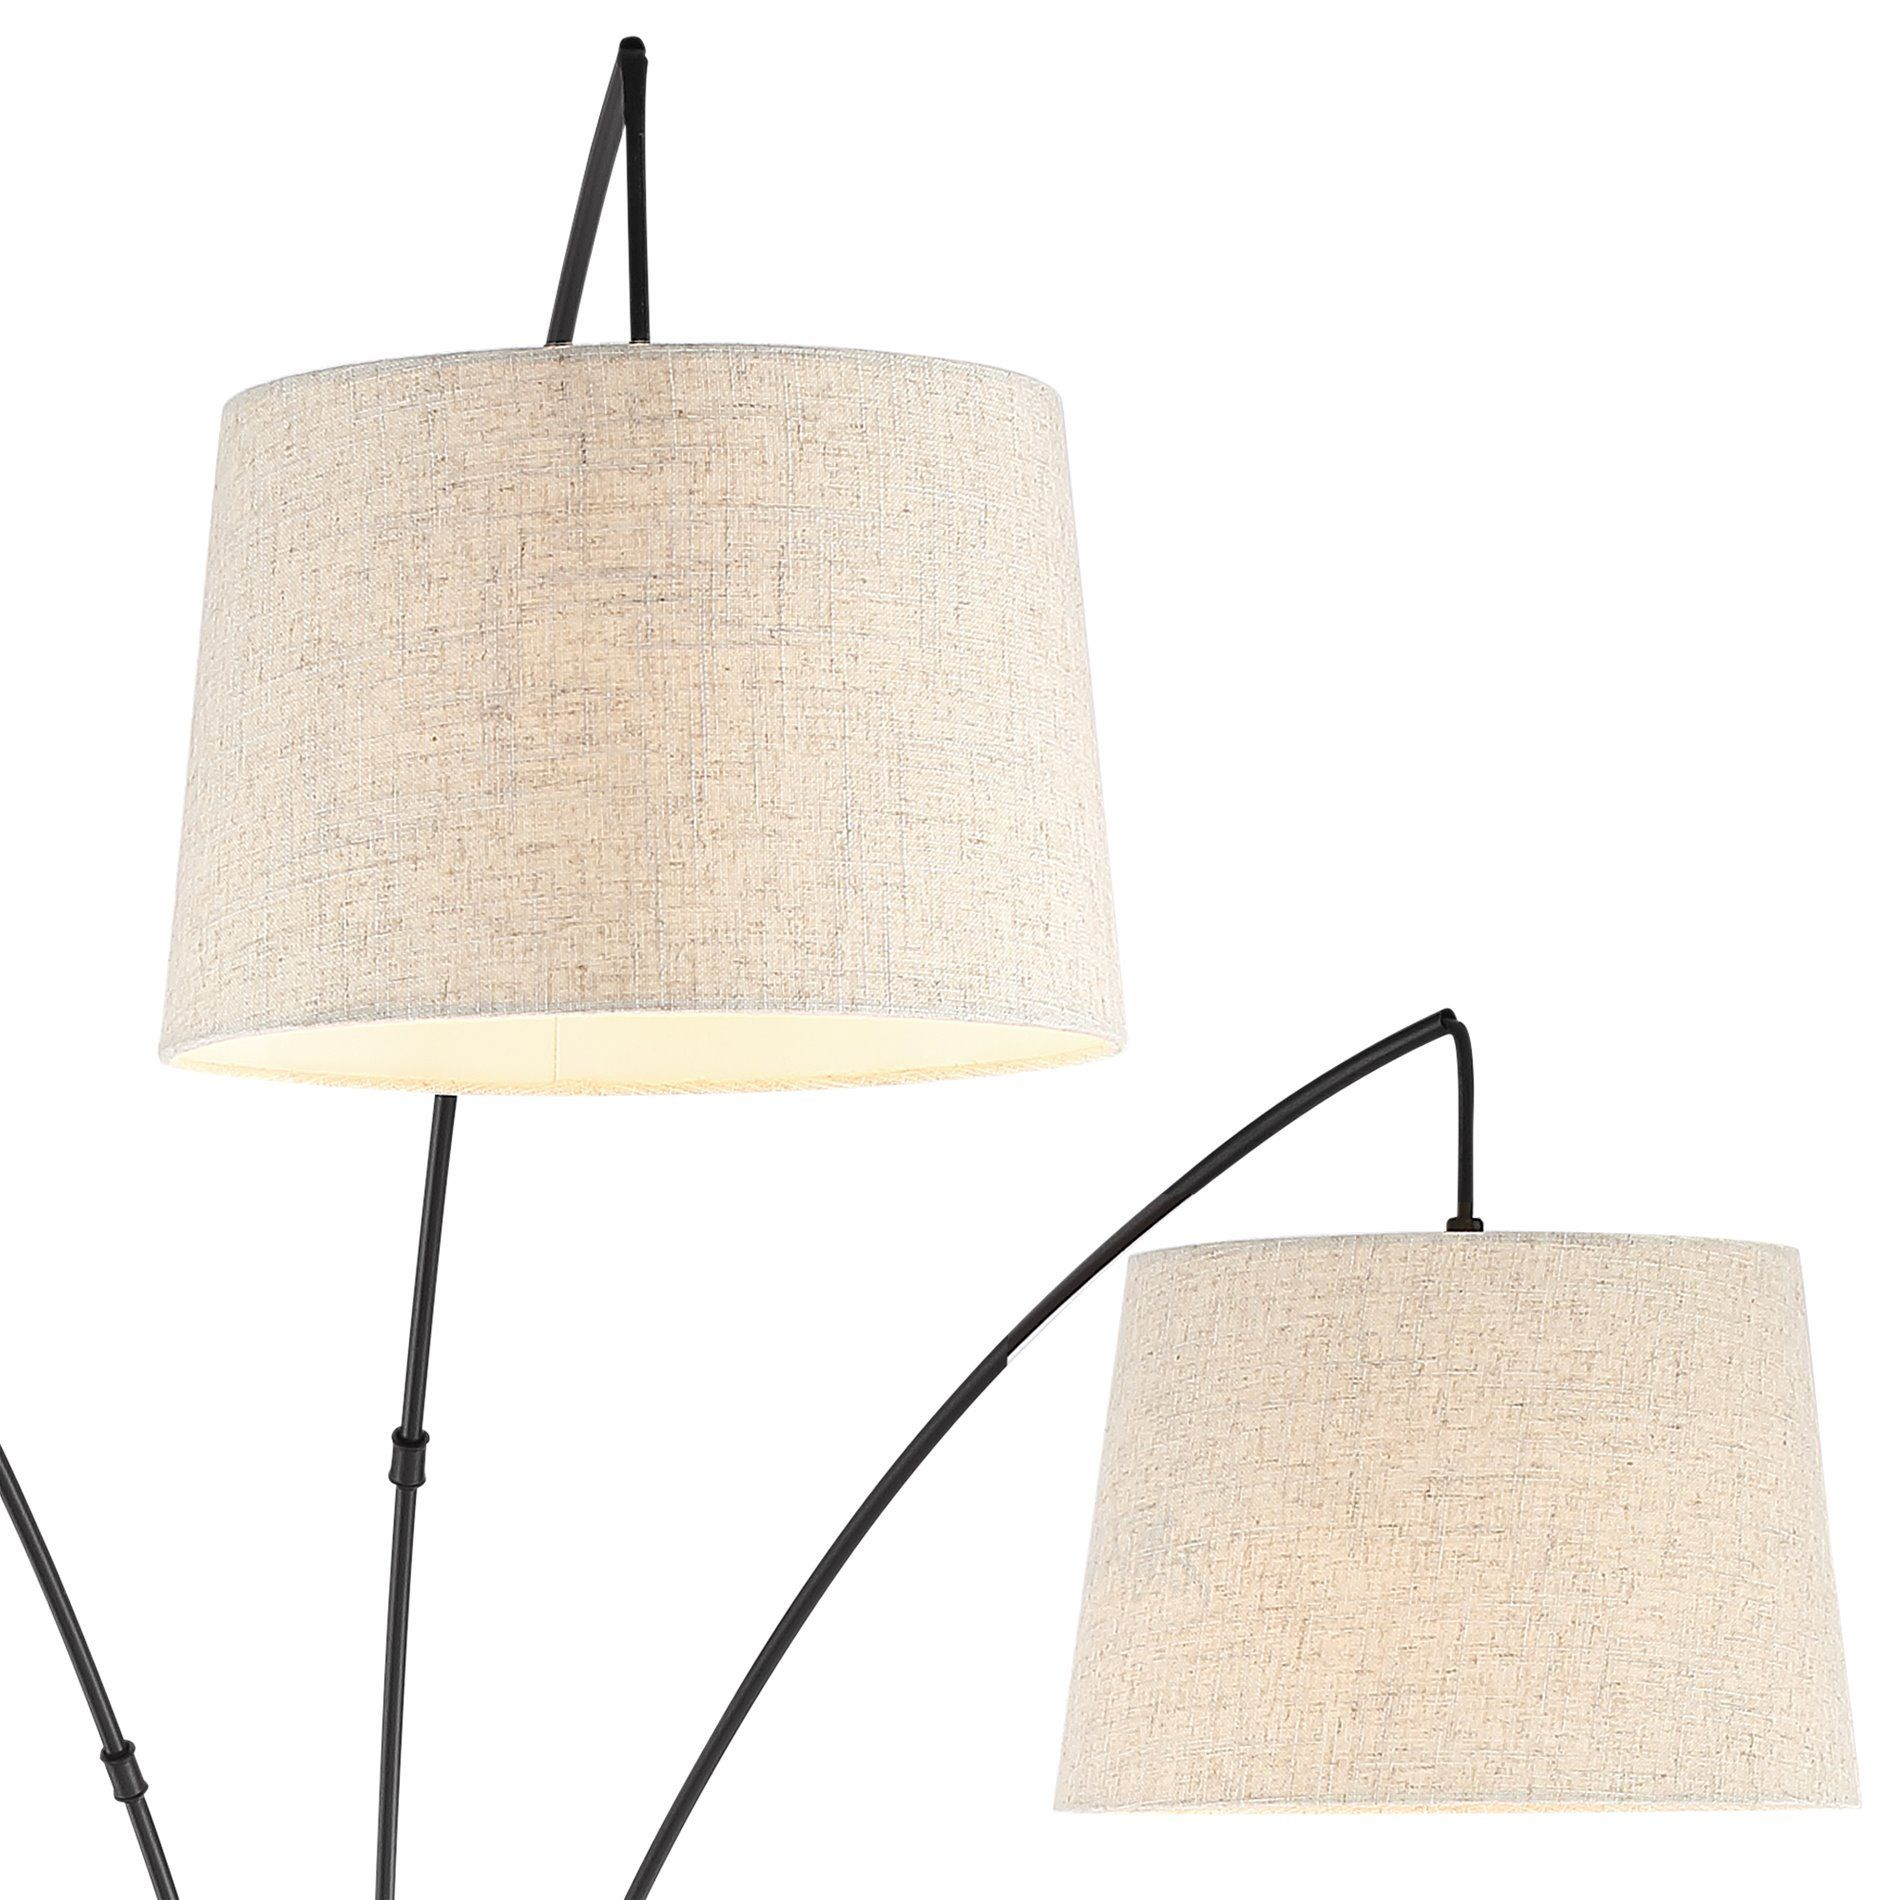 Kira Home Akira 78.5 Modern 3Light Arc Floor Lamp with